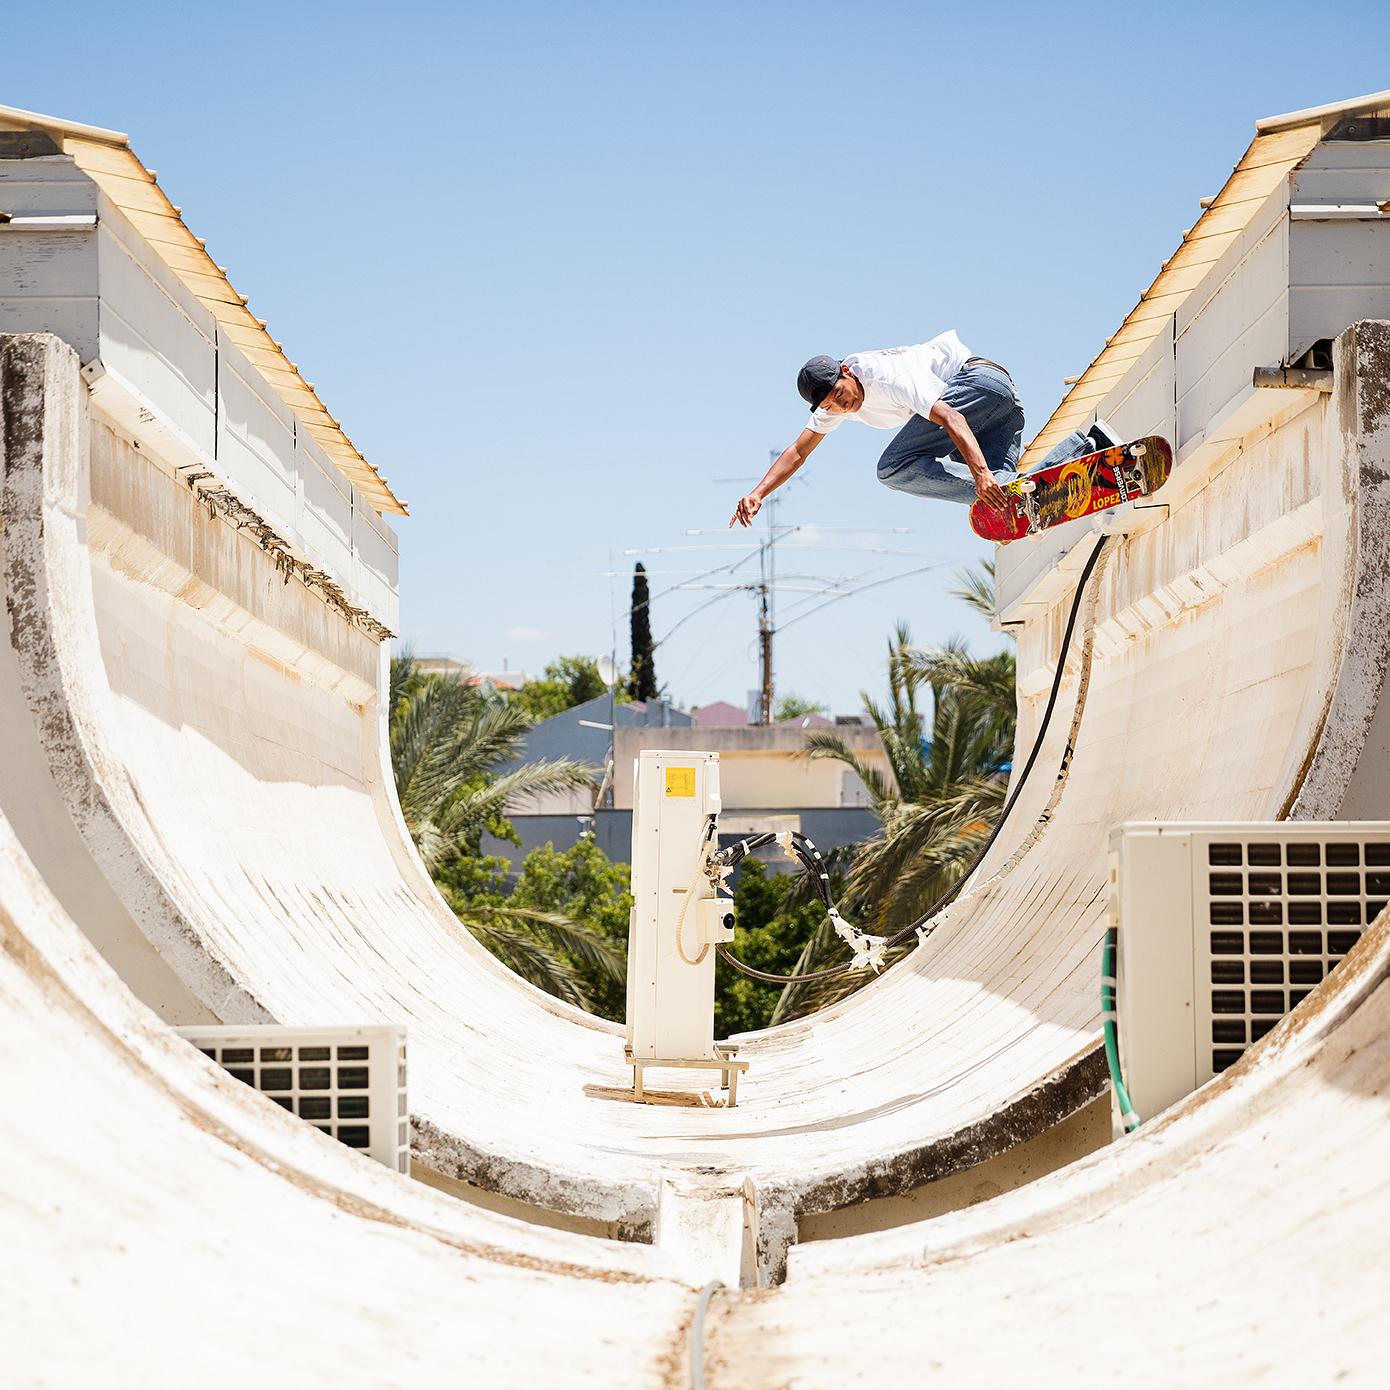 louie lopez usa skateboarding